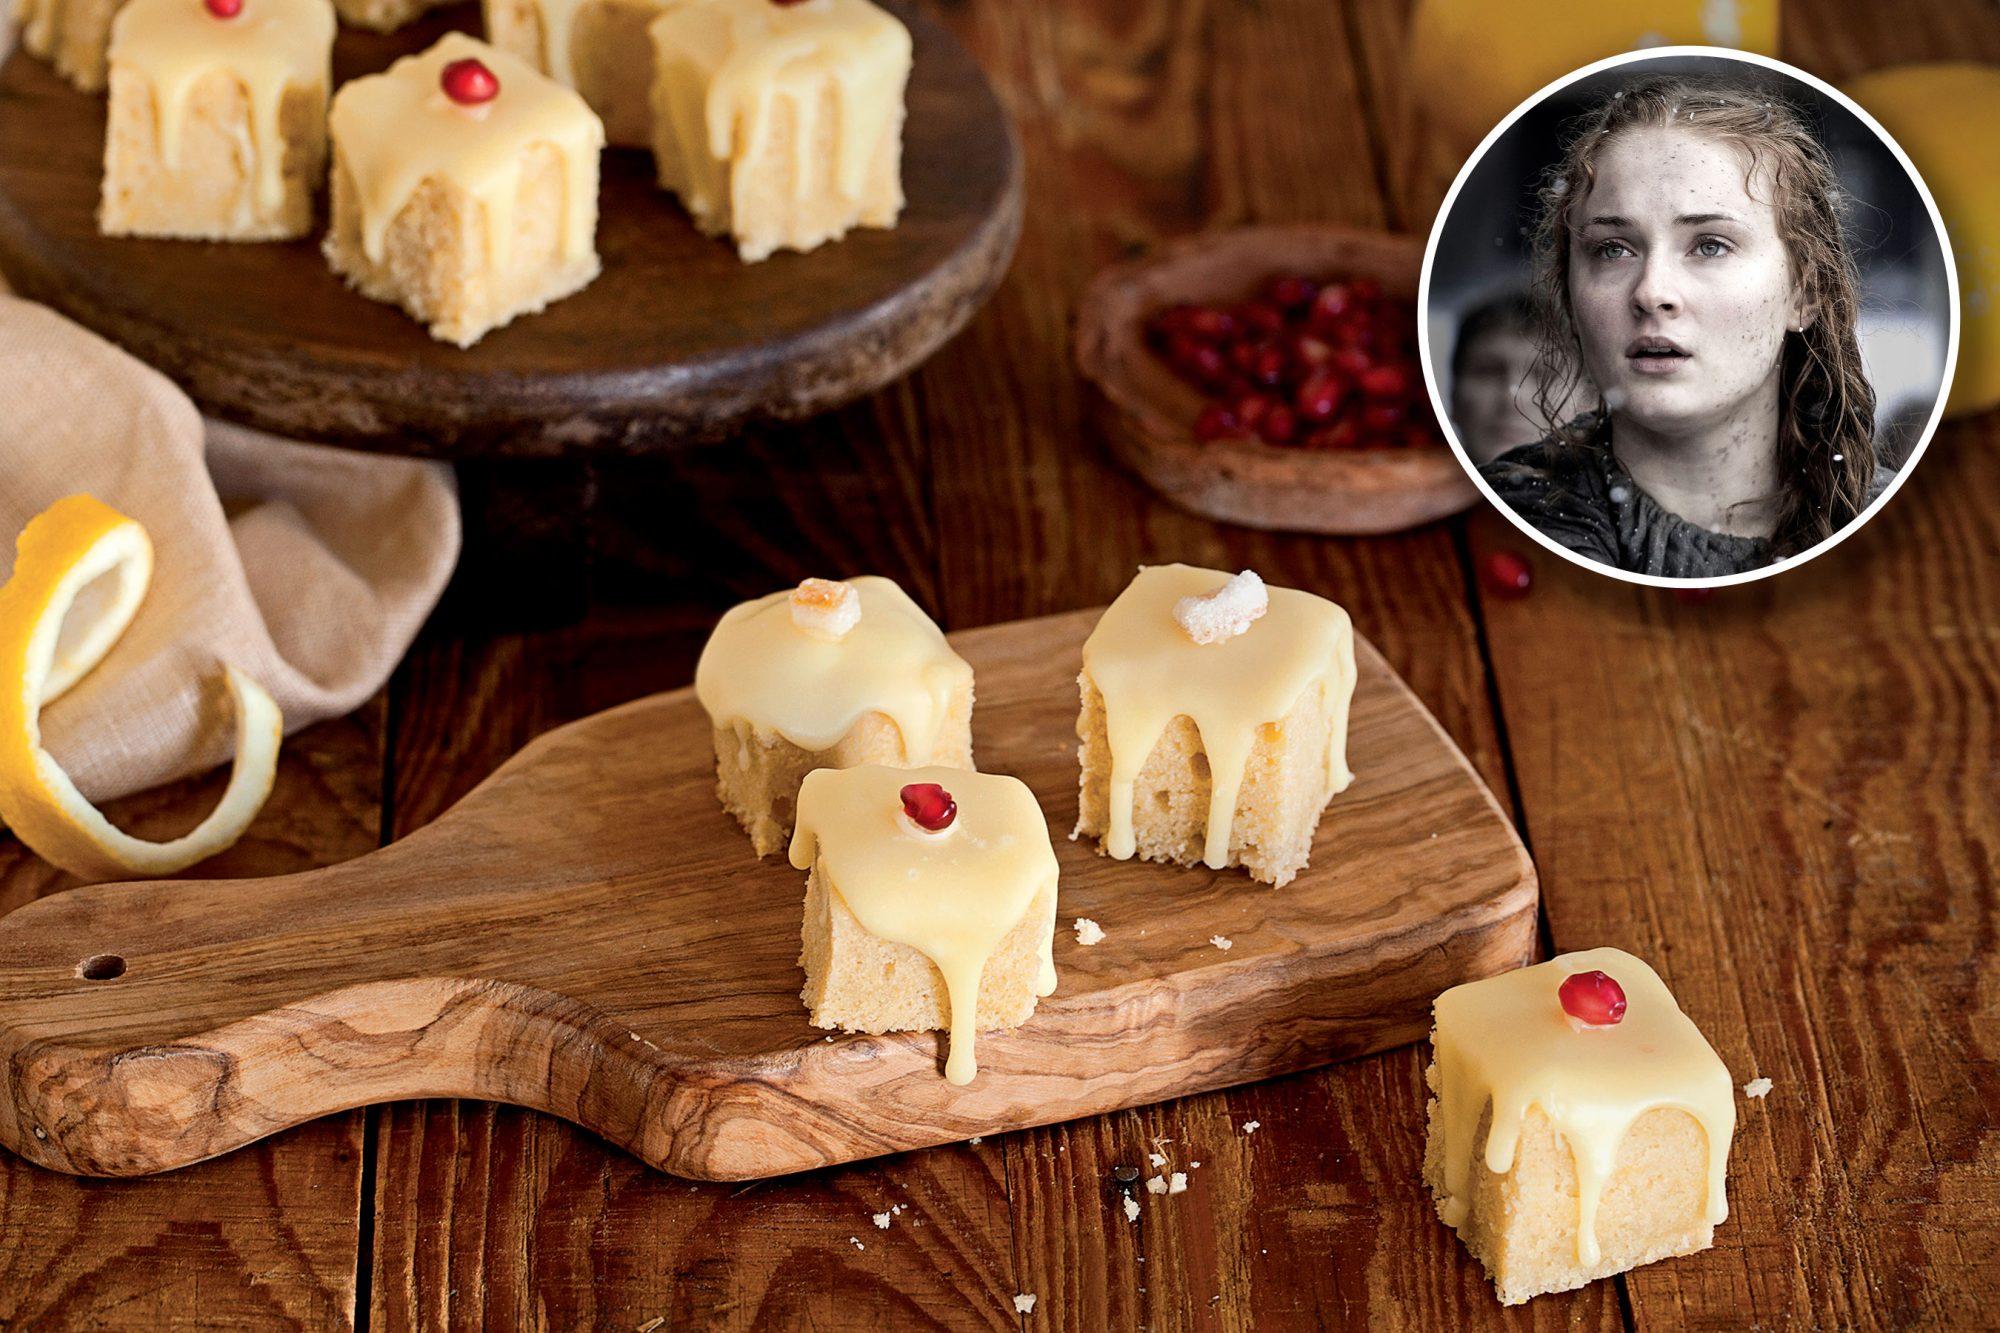 Lemon Cakes/ Sansa Stark